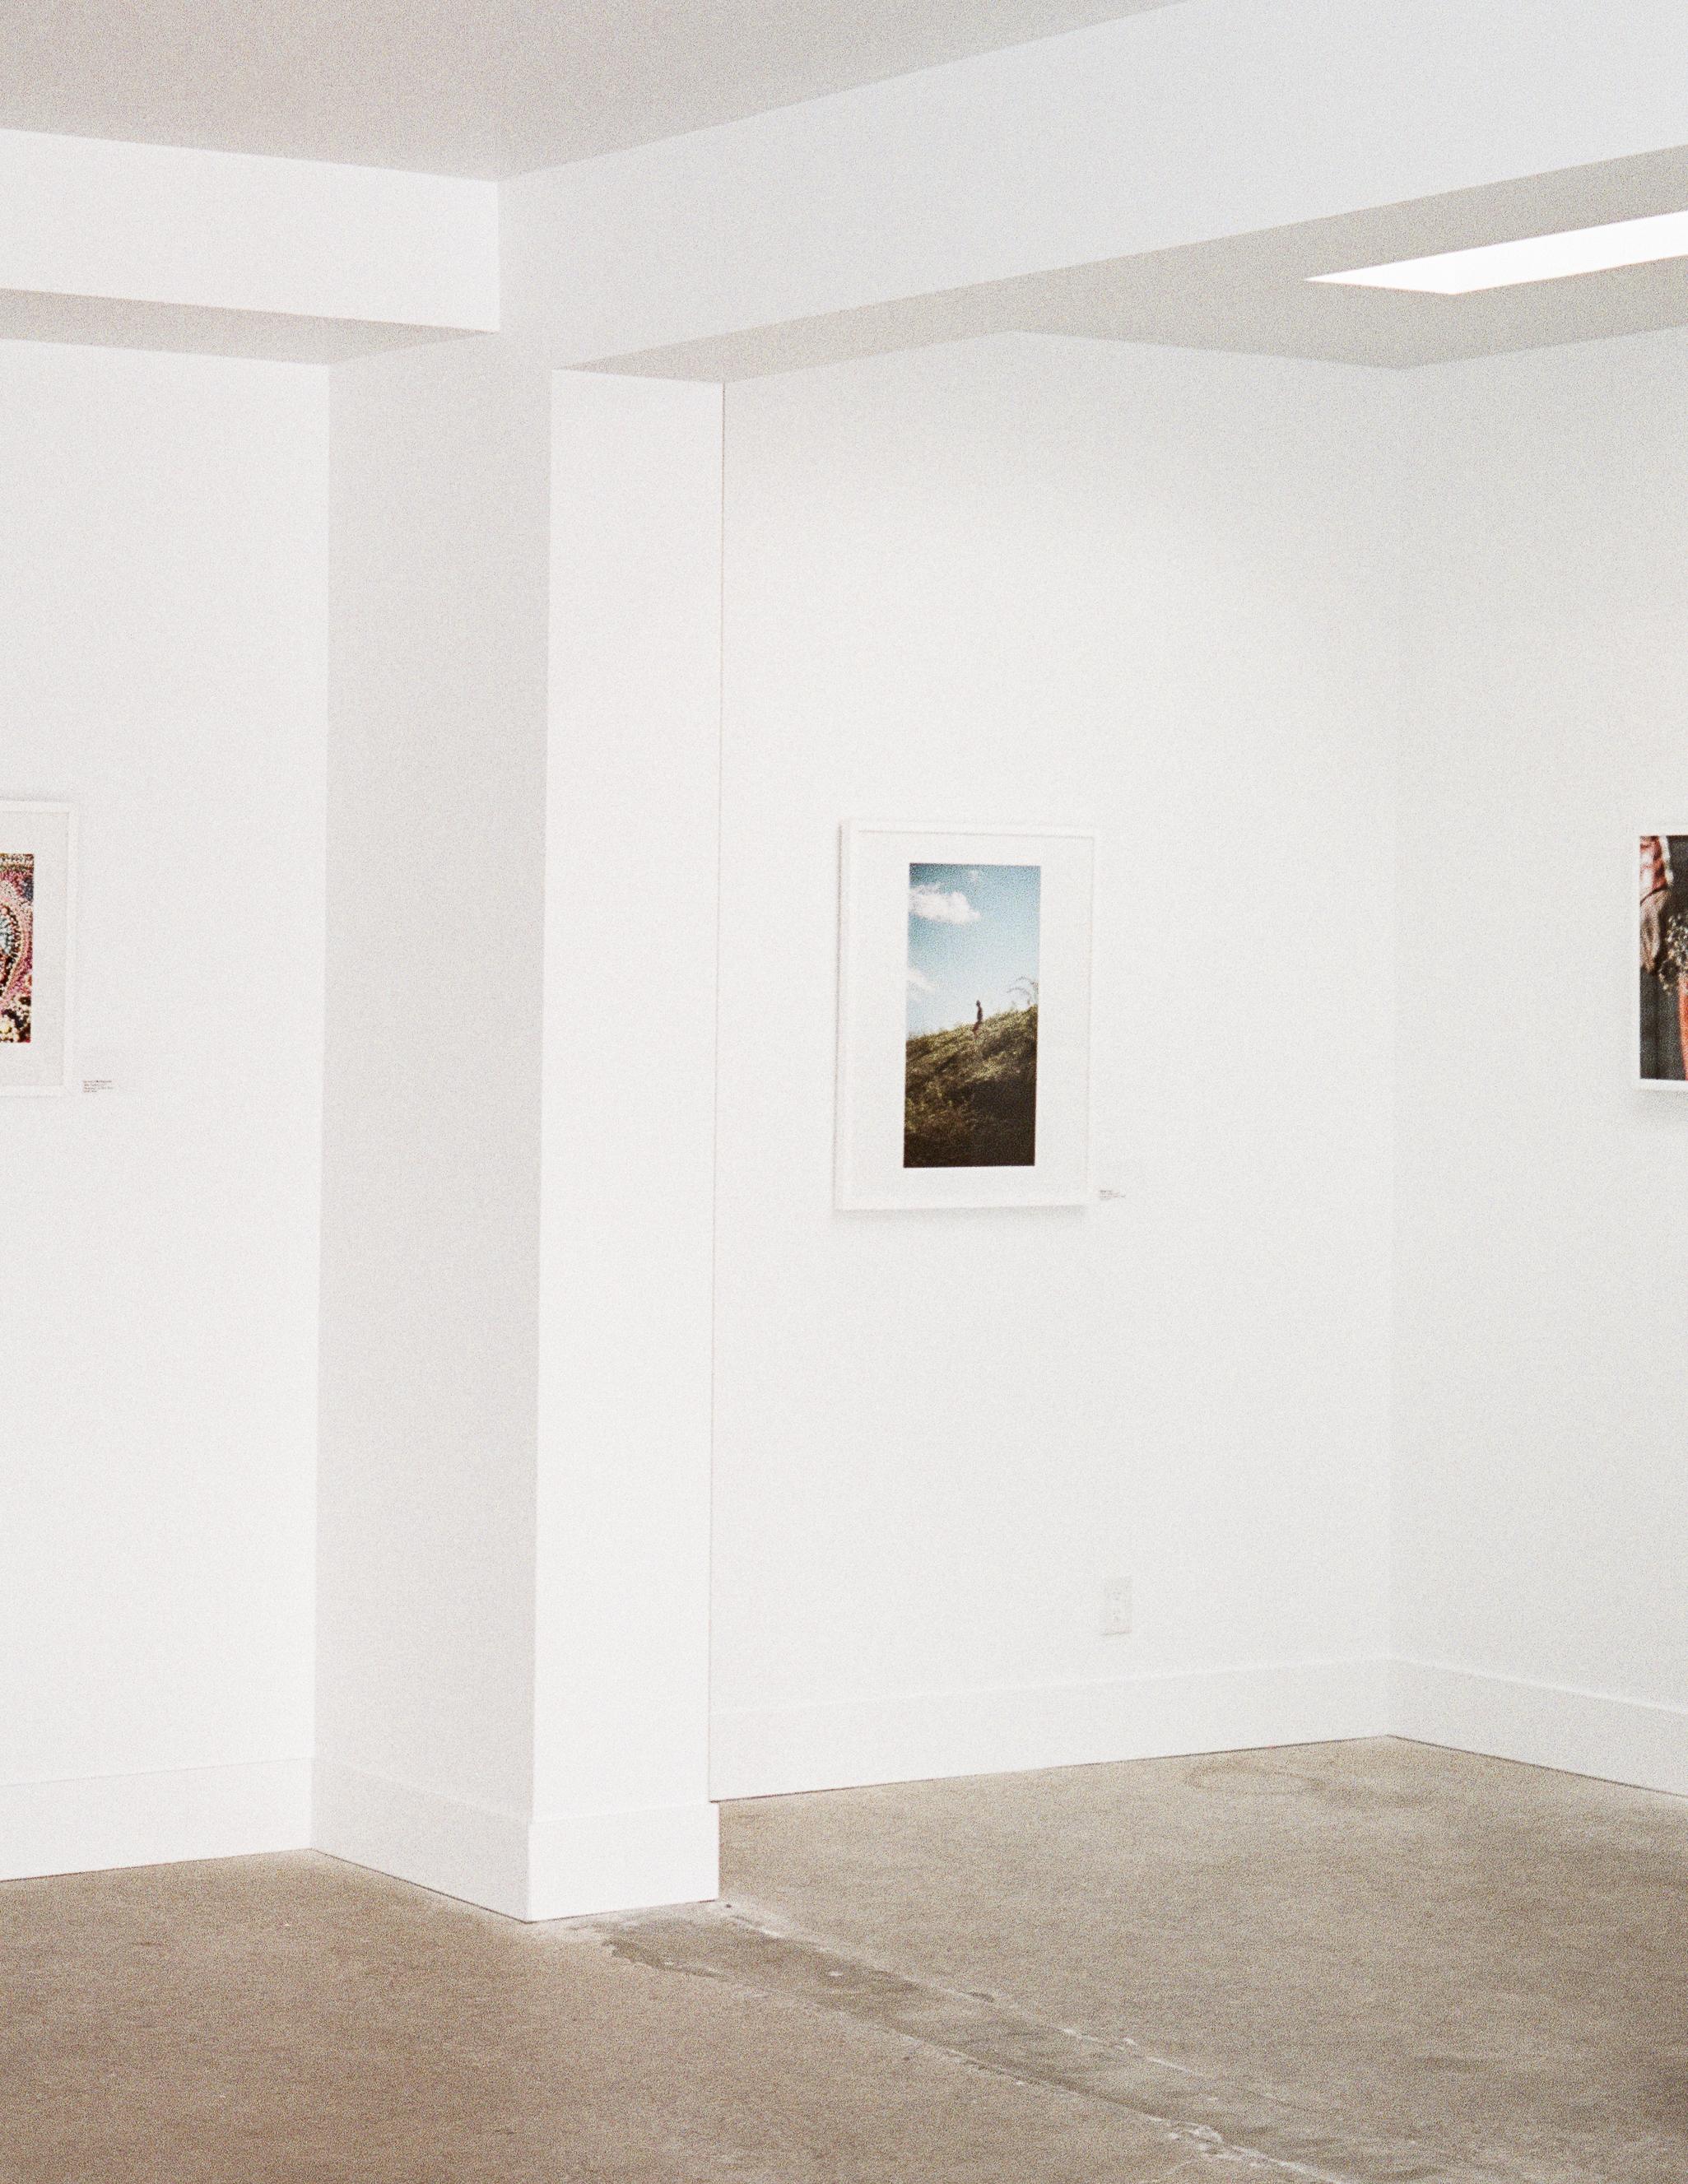 Janeteas_Freudian_Gallery_Finals-8.jpg